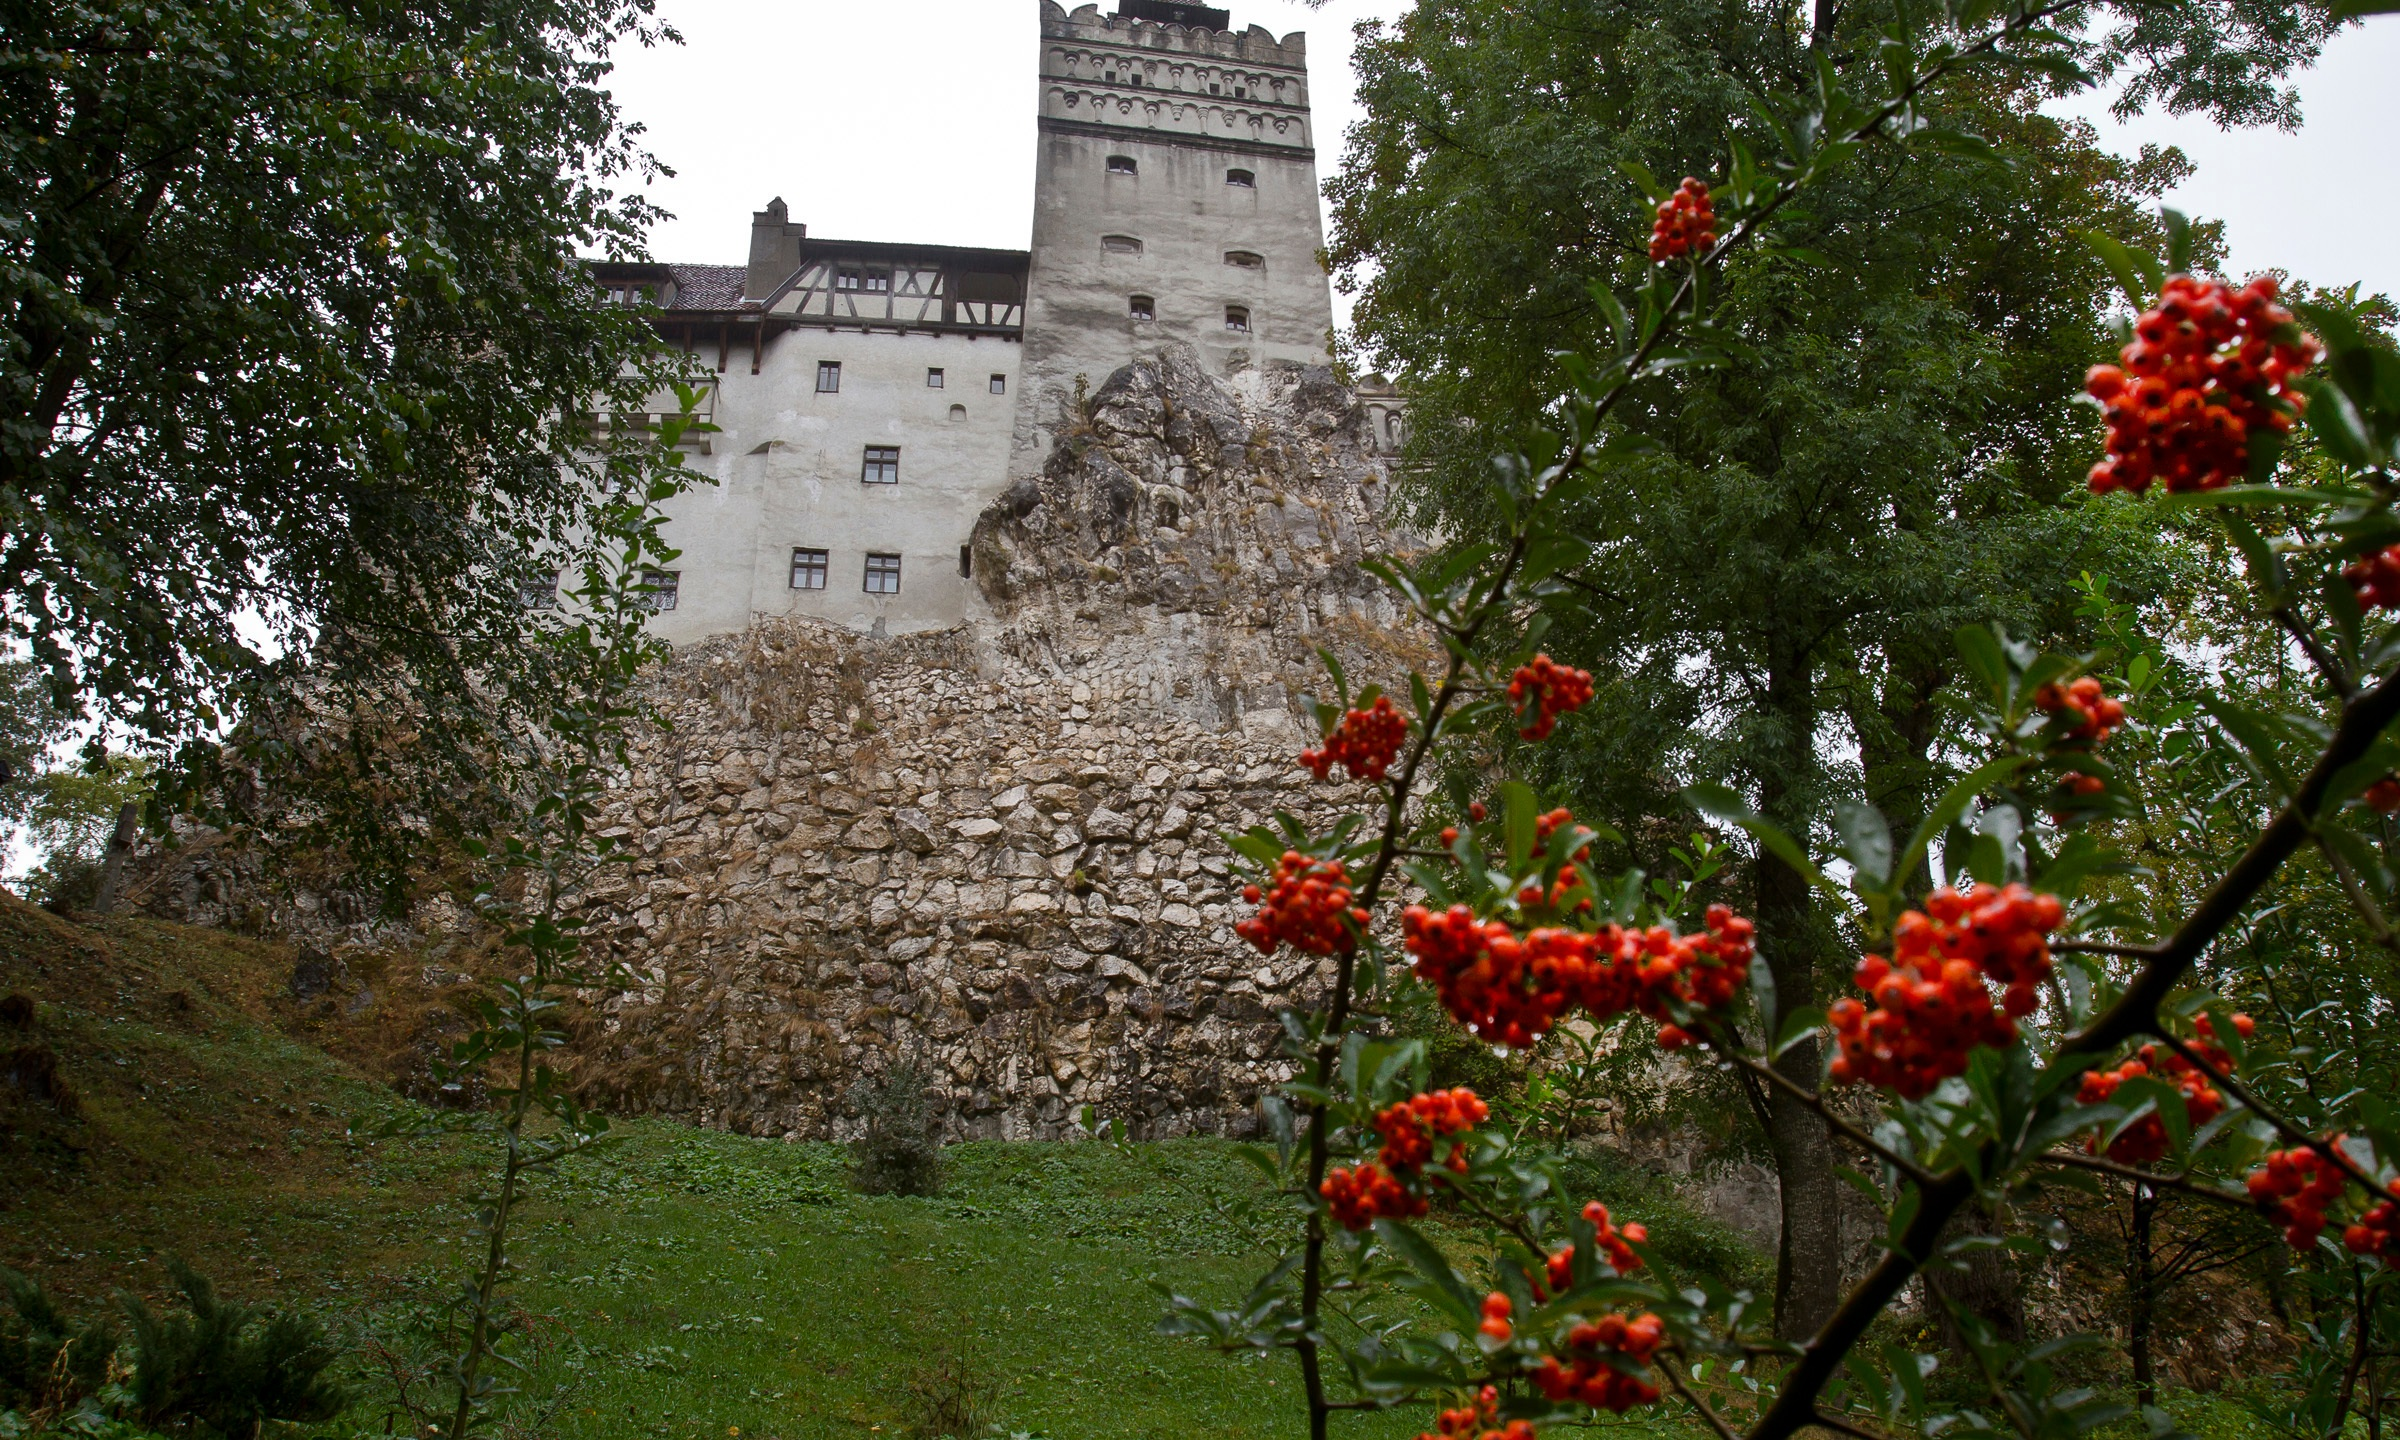 Dracula castle in Romania offering COVID vaccines